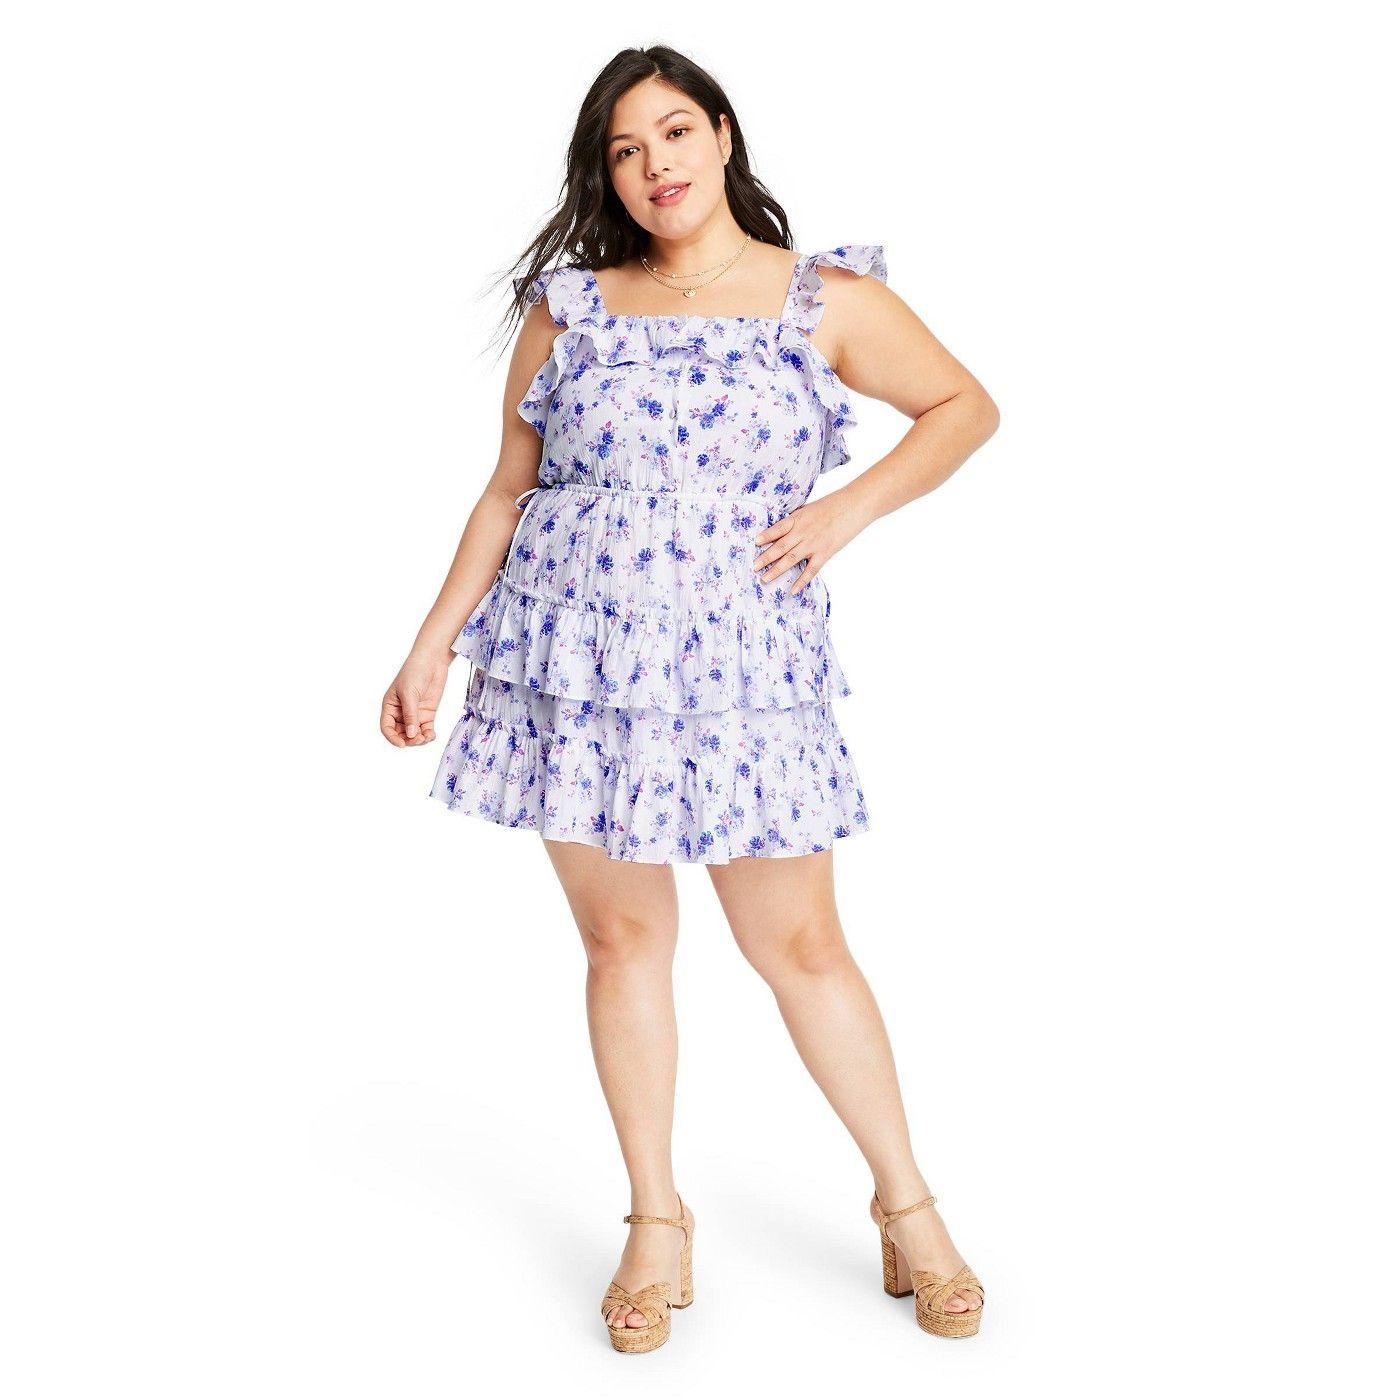 Women S Amalie Tiered Ruffle Dress Loveshackfancy For Target Regular Plus White Blue Sponsored Ruffle Sponso Tiered Ruffle Dress Ruffle Dress Dresses [ 1400 x 1400 Pixel ]